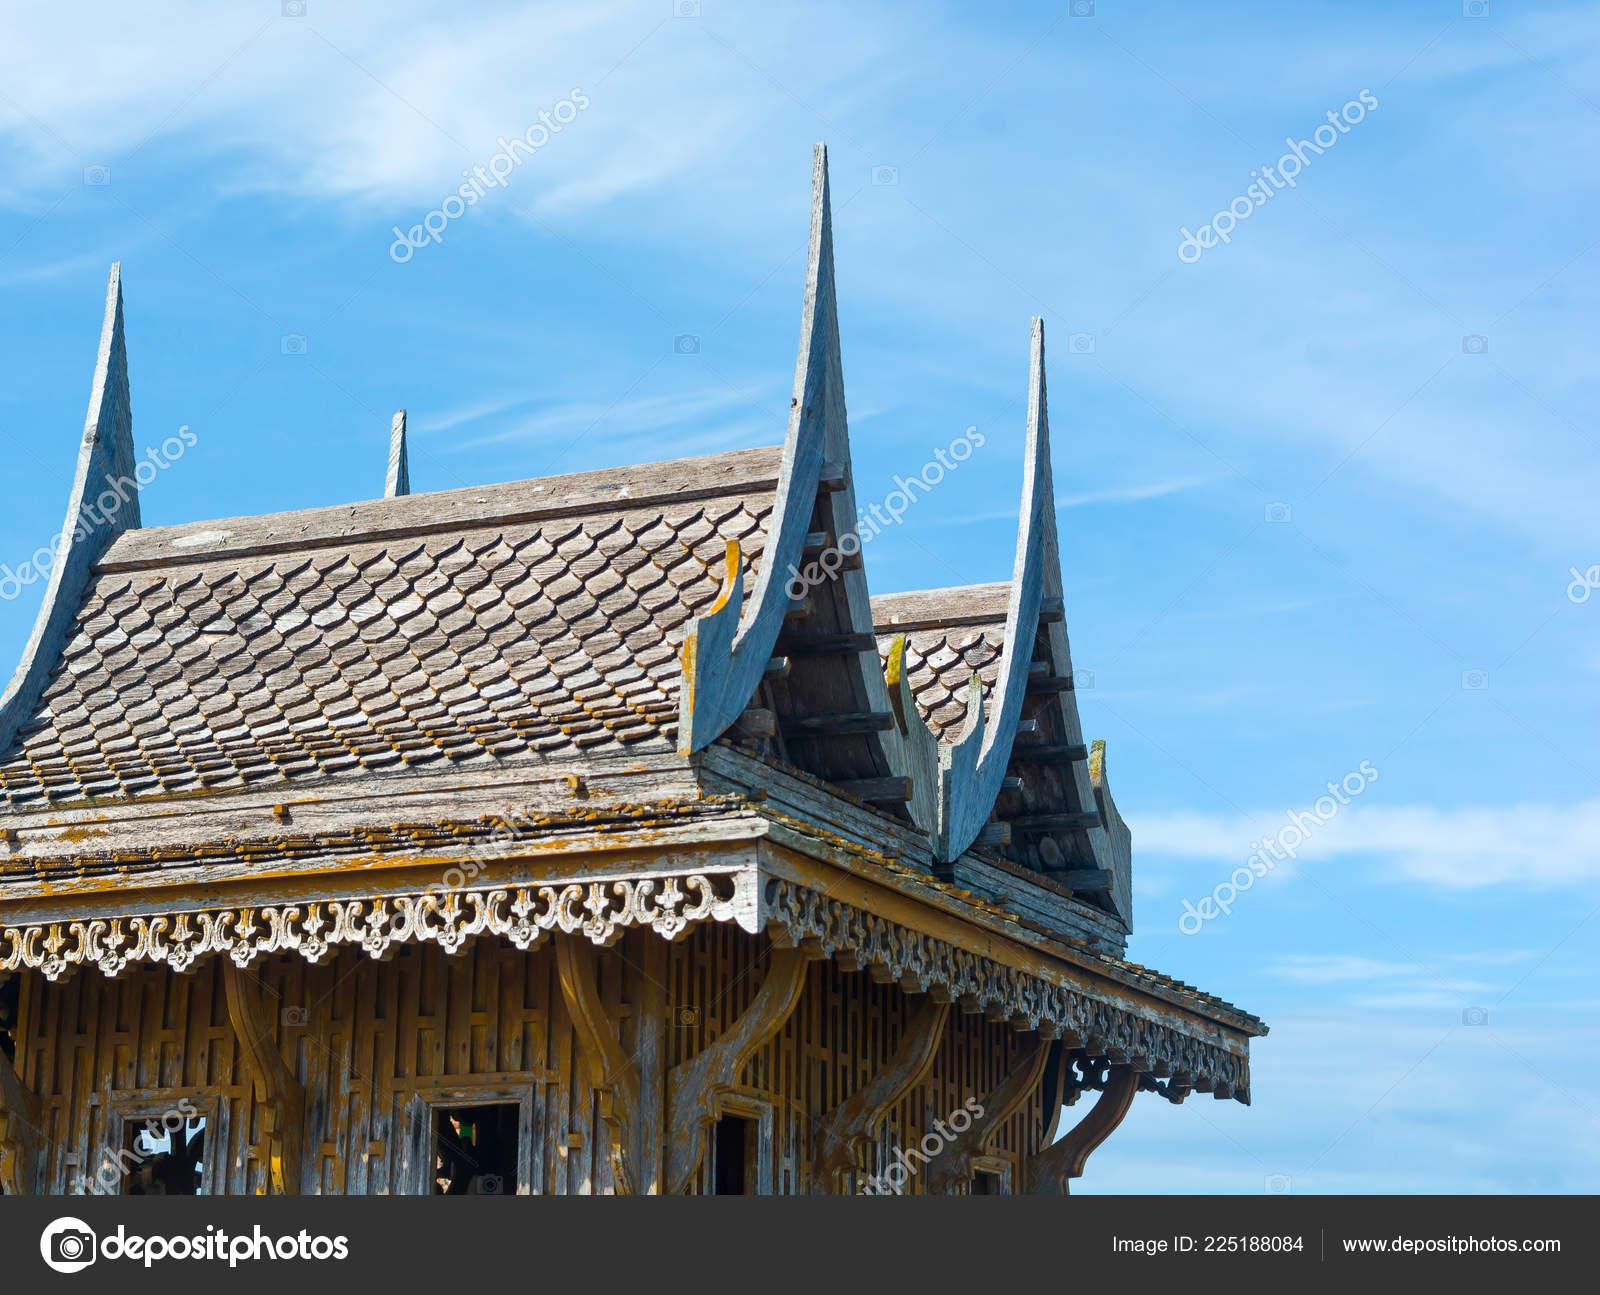 Pictures Thai House Designs Architecture Art Style Thai House Thailand Unique Roof Top Design Stock Photo C Asiaoutlook Gmail Com 225188084